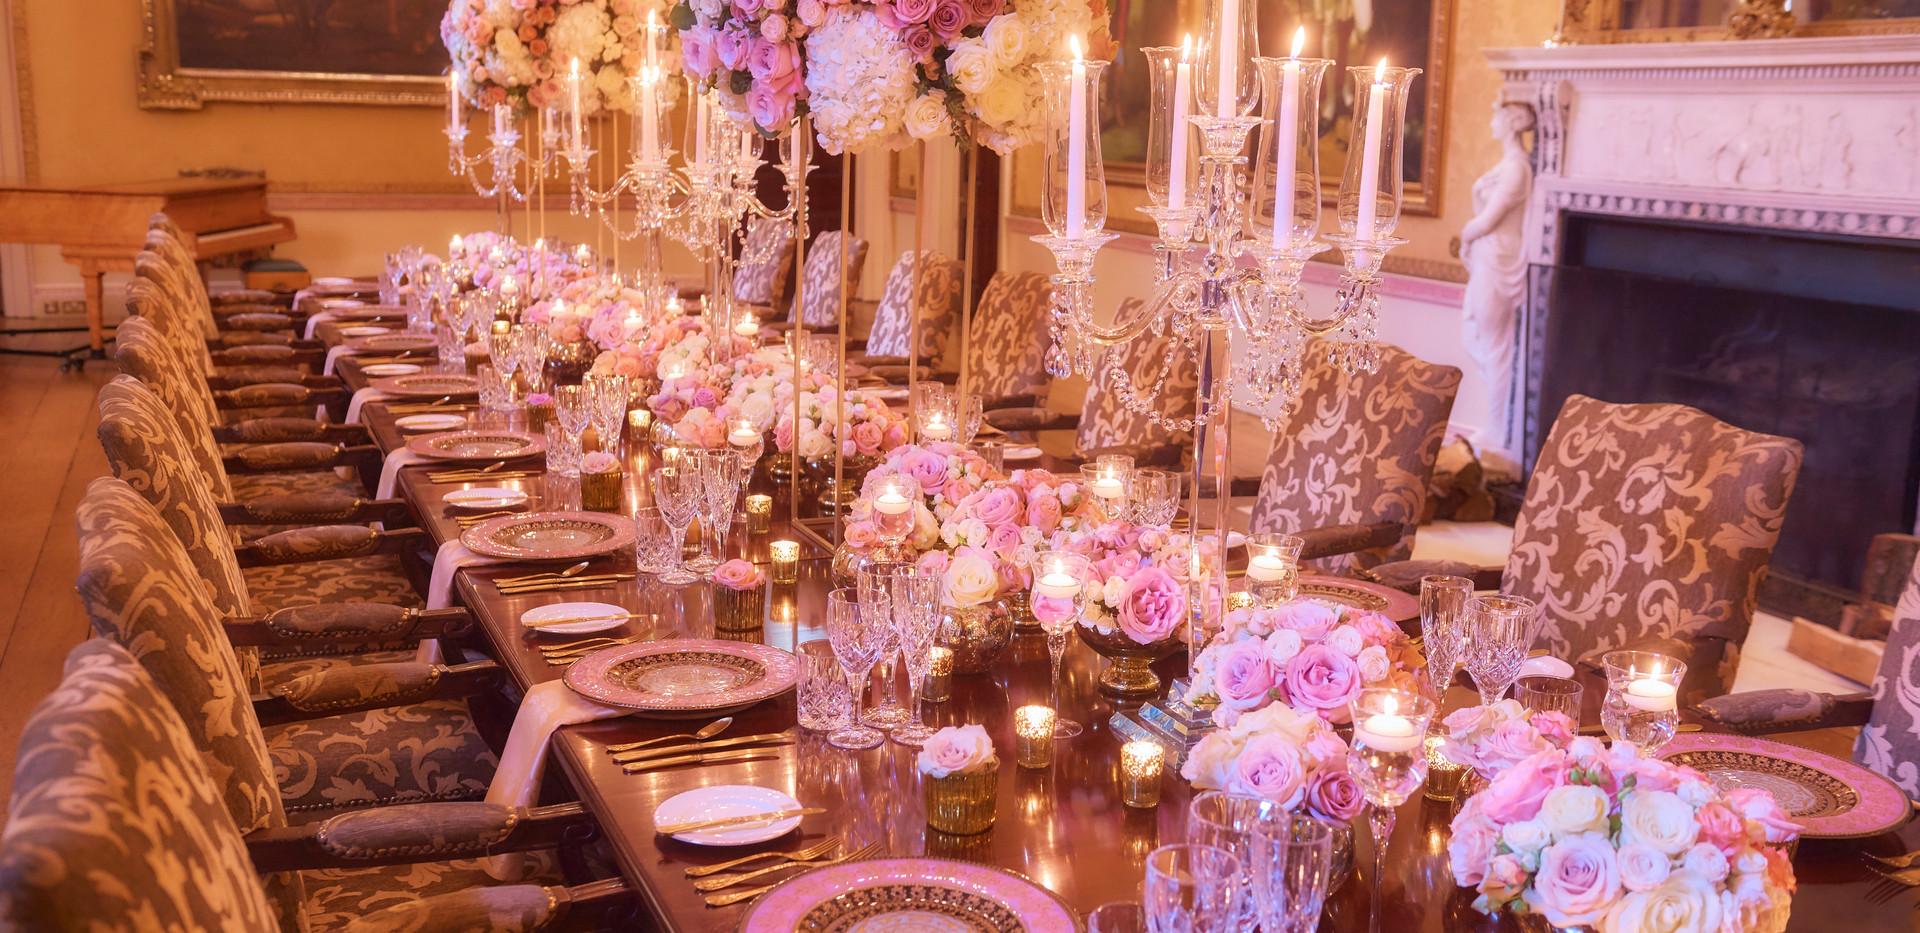 Full Wedding Table